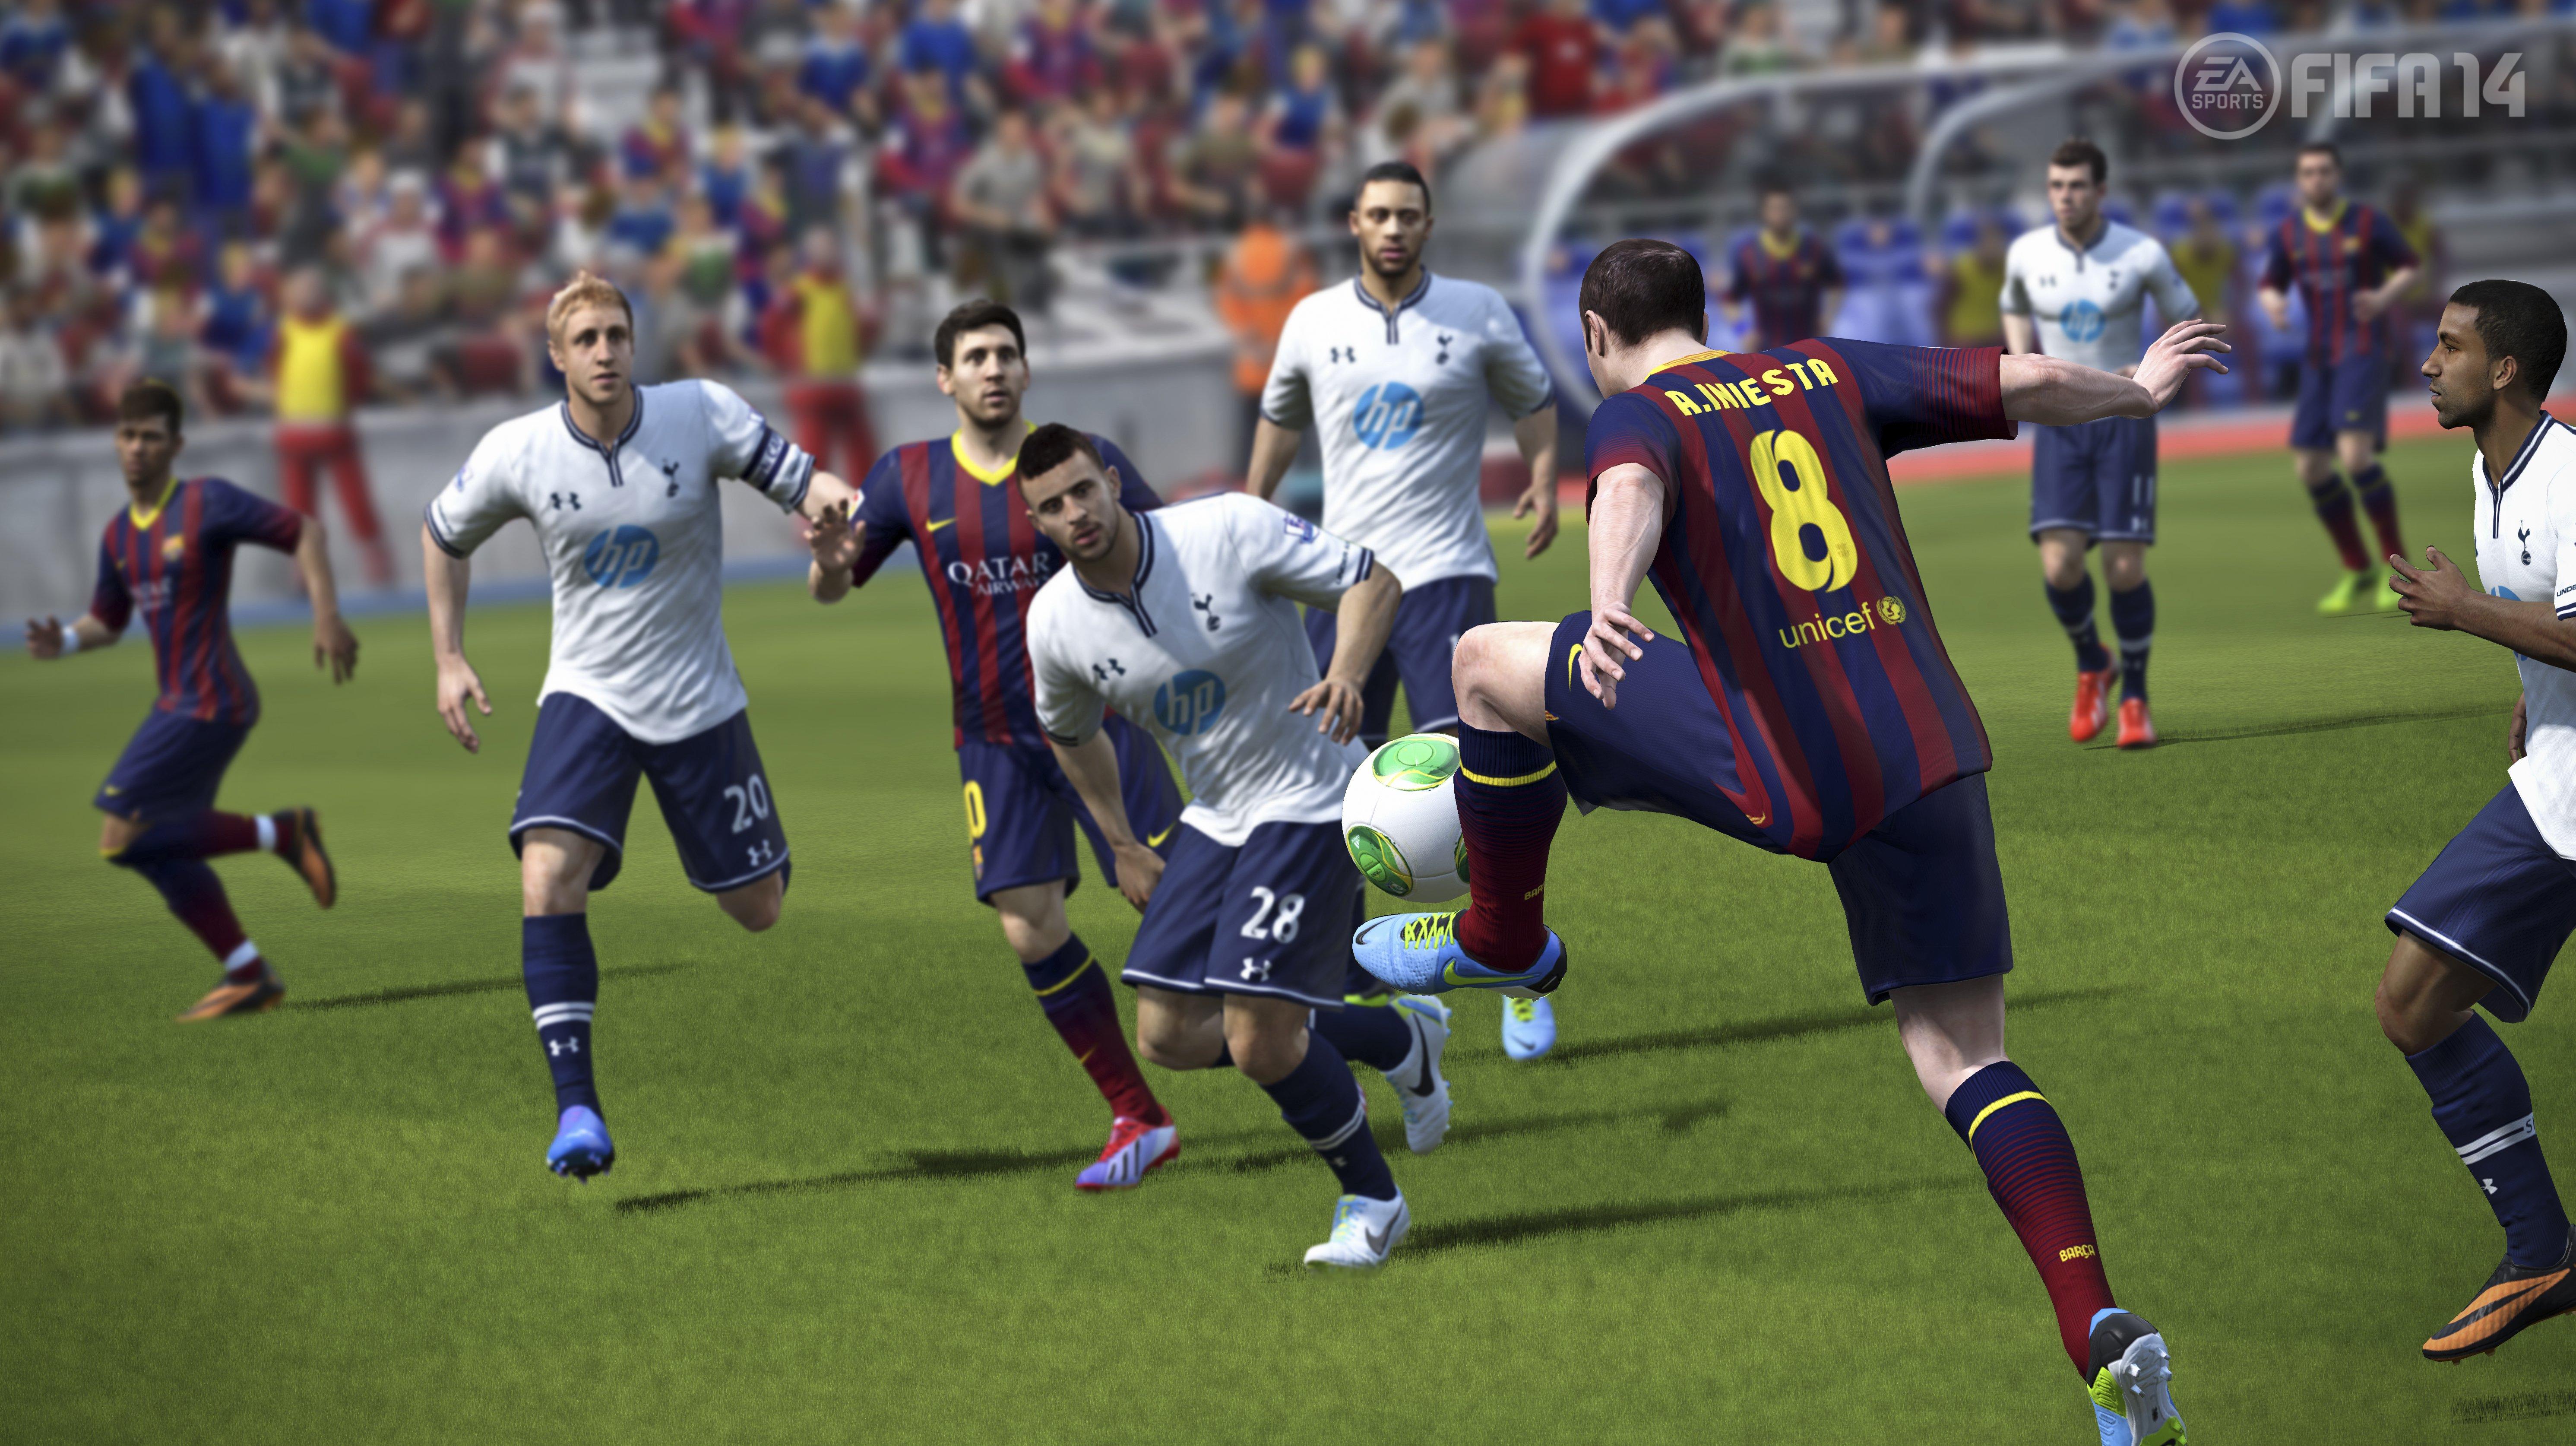 soccer game fifa